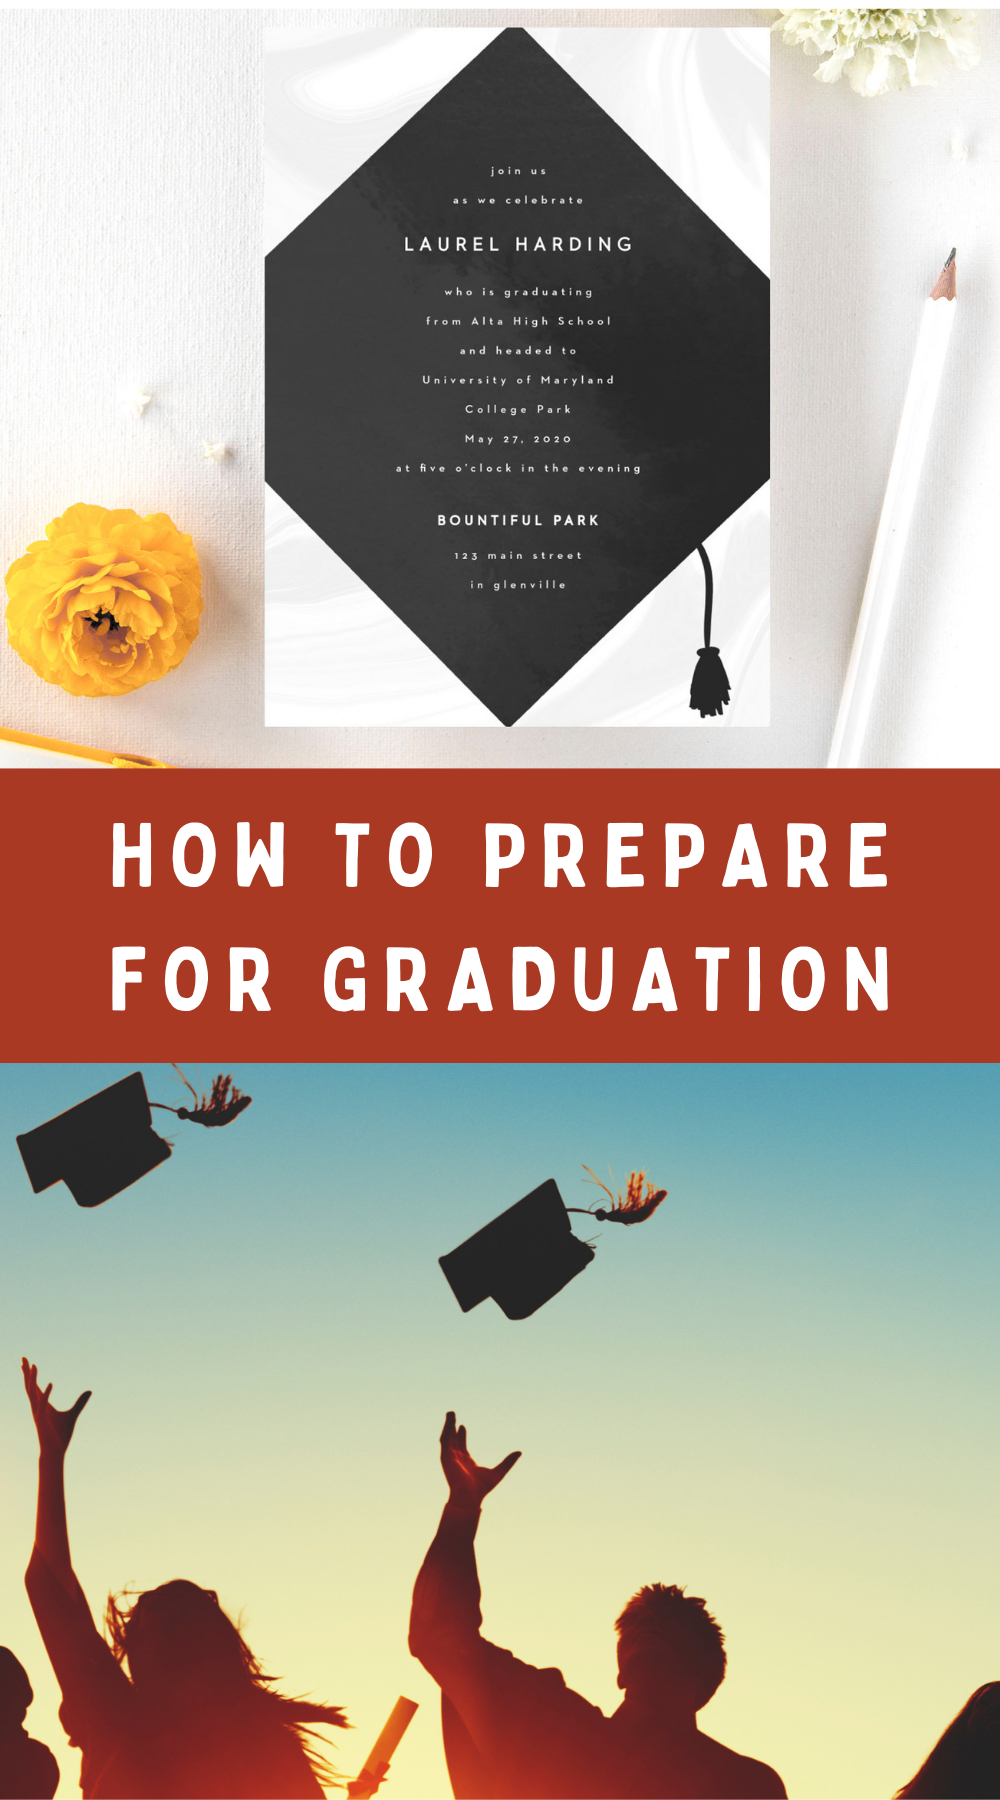 How to Prepare for Graduation